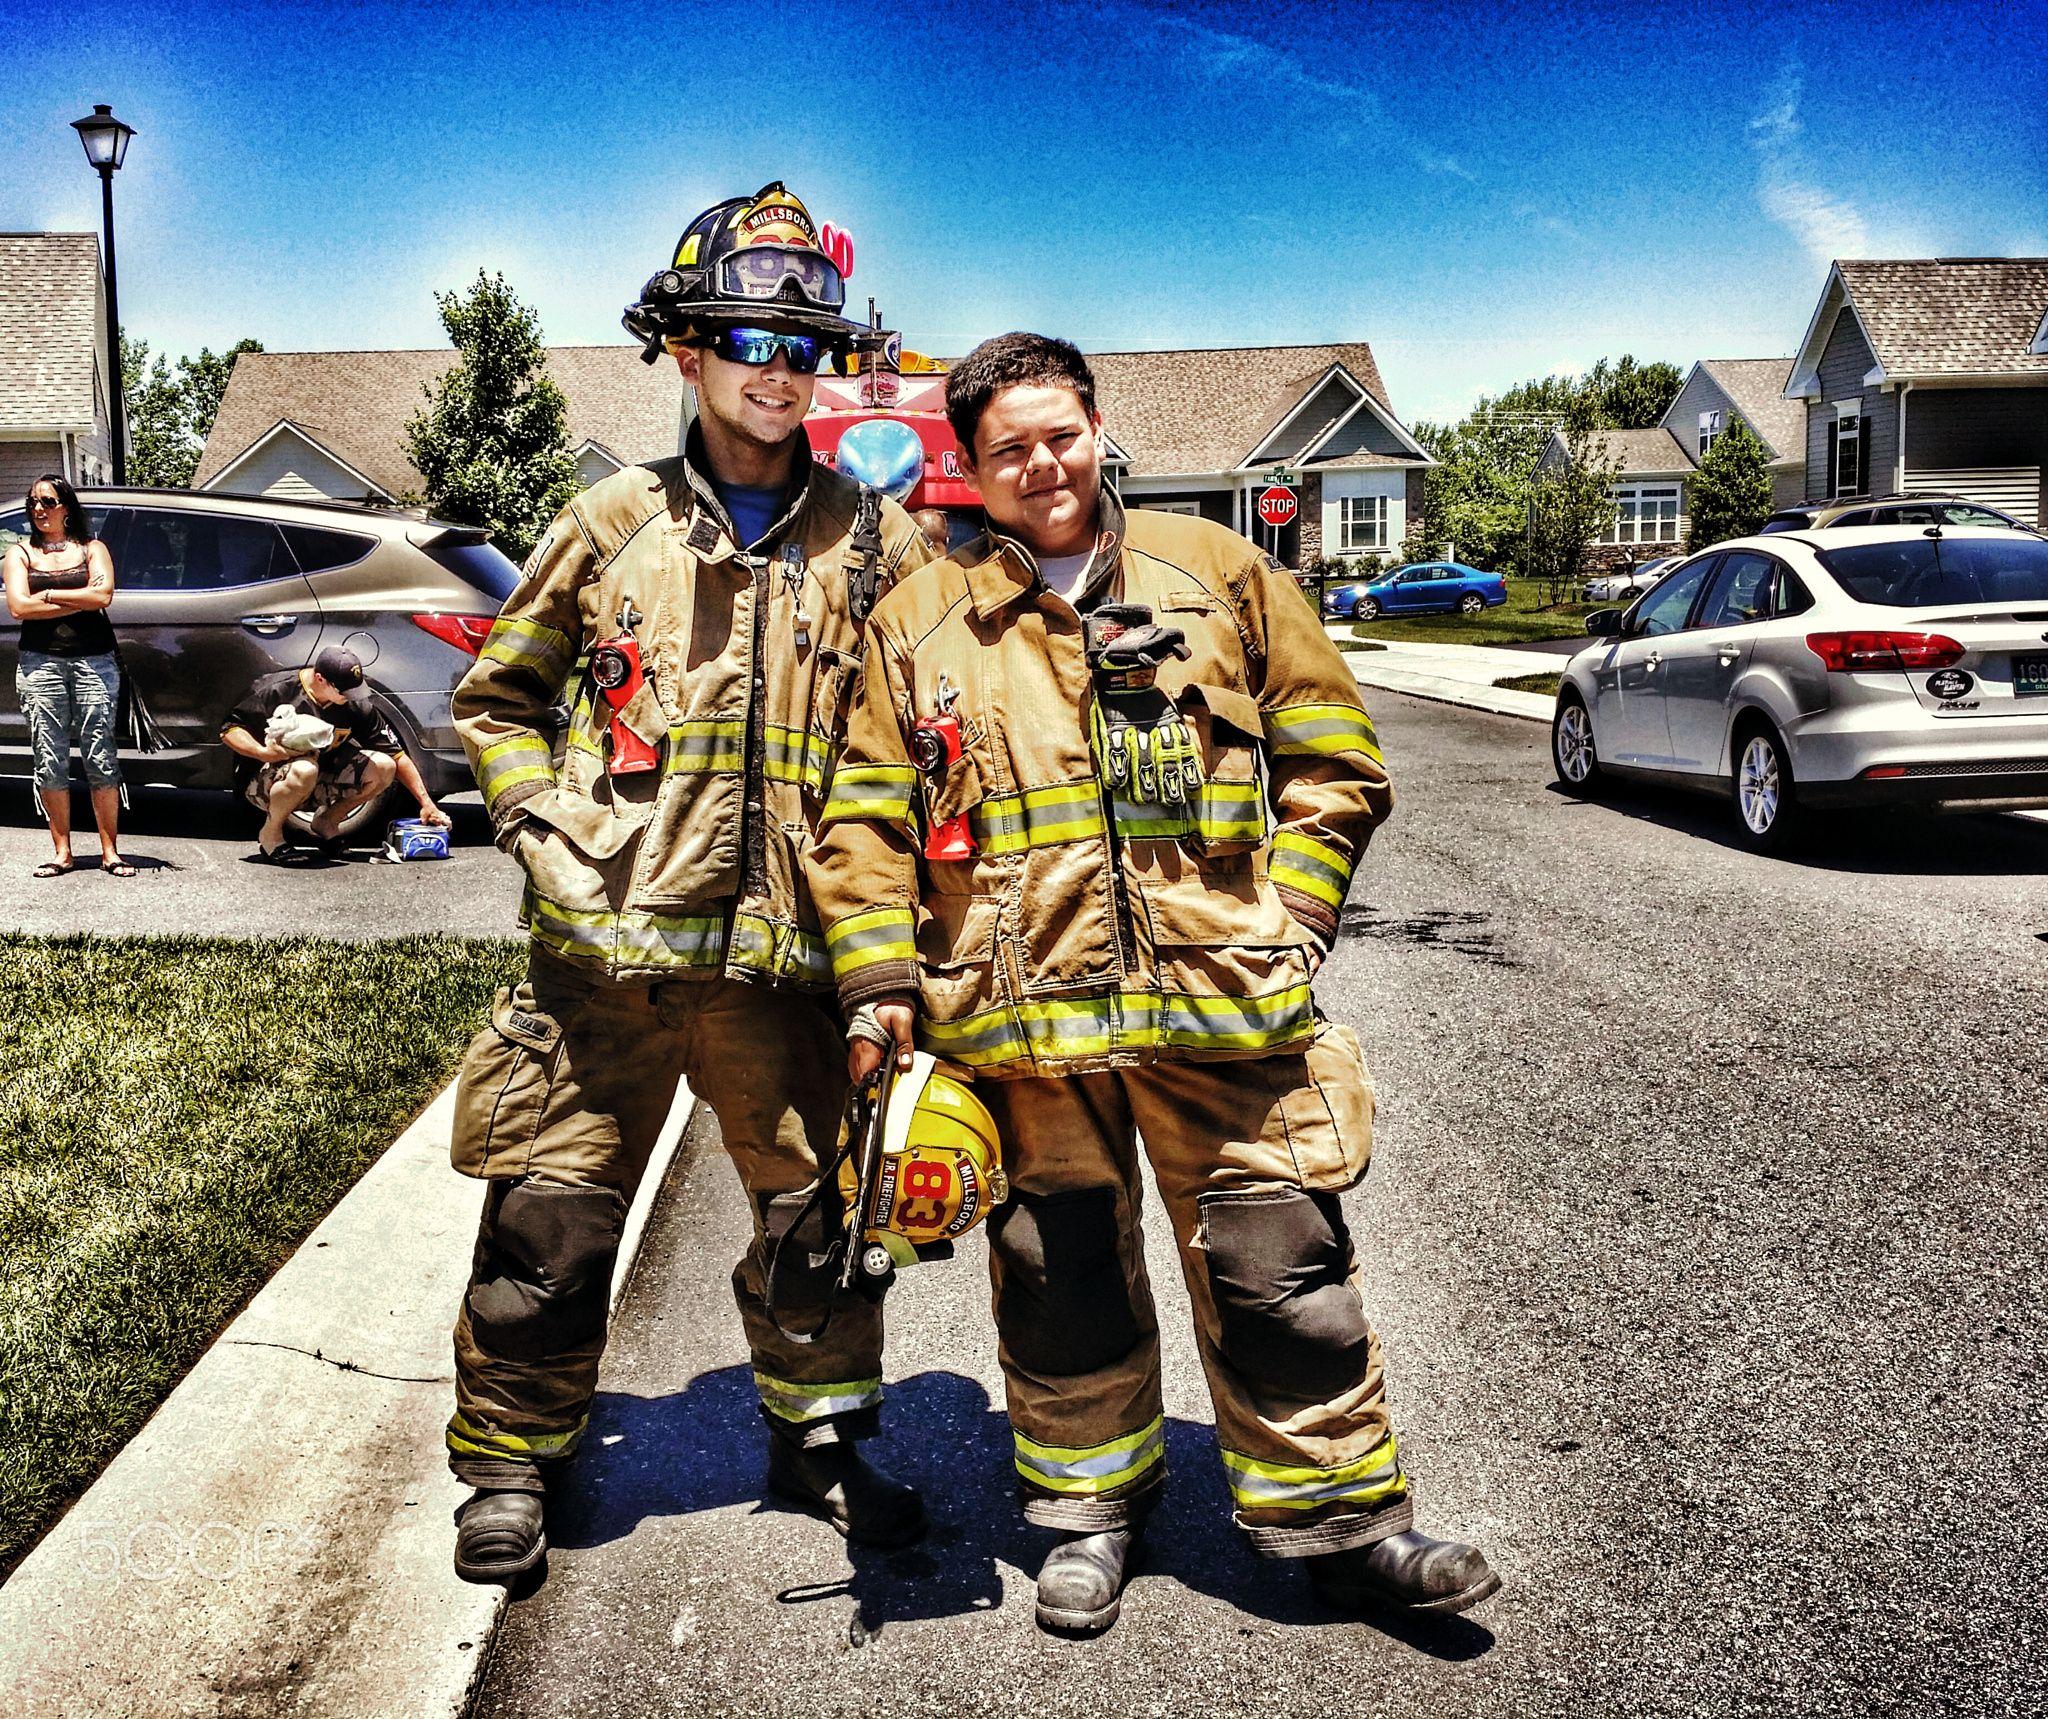 Volunteer firefighters millsboro fire company members